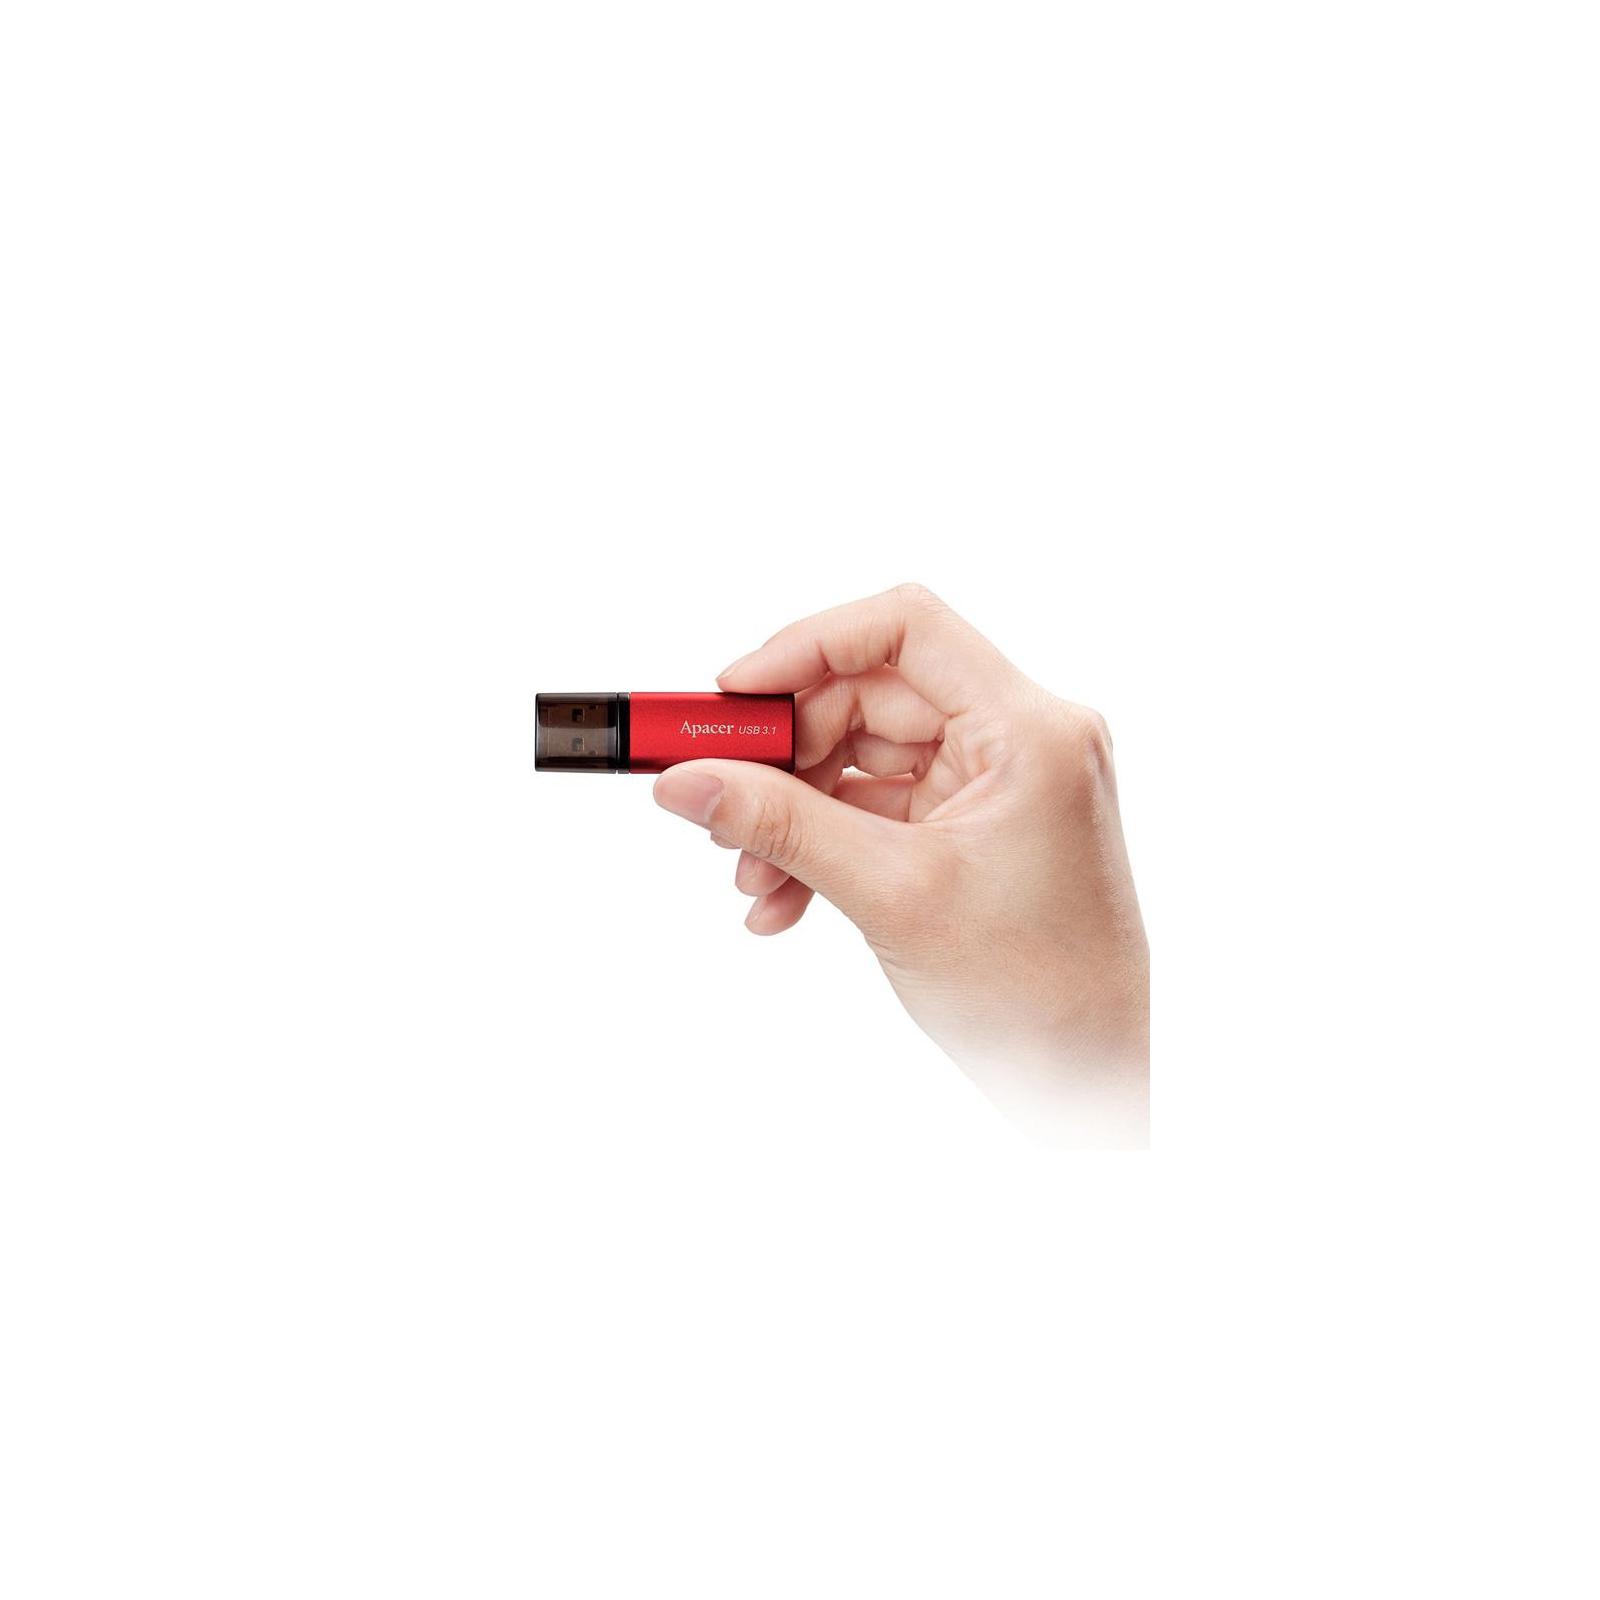 USB флеш накопитель Apacer 32GB AH25B Red USB 3.1 Gen1 (AP32GAH25BR-1) изображение 4